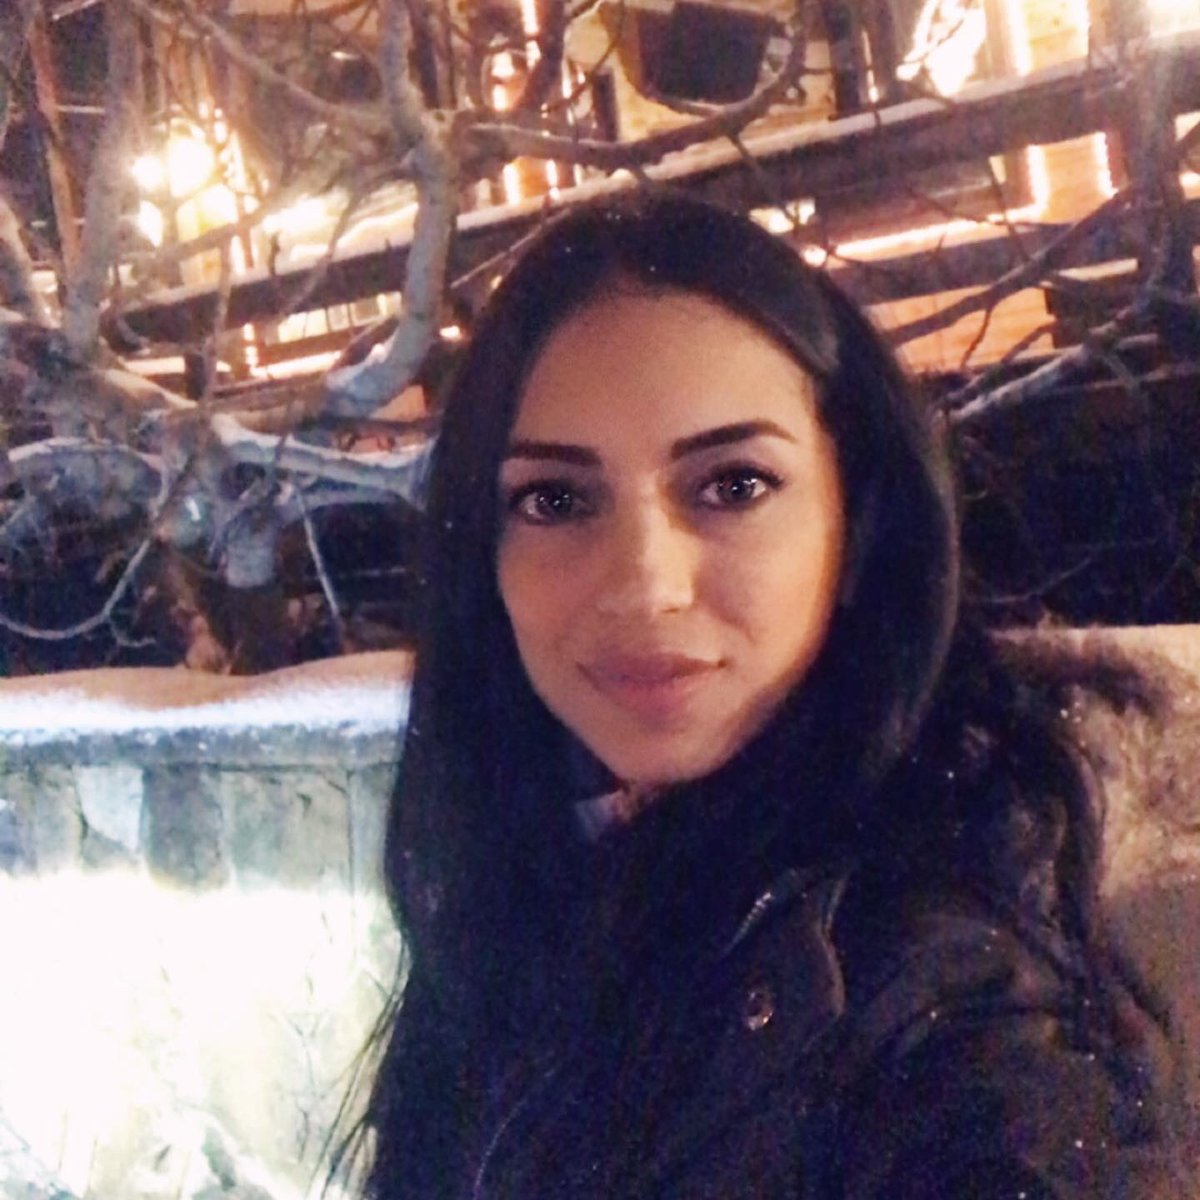 𝐒𝐭𝐫𝐨𝐧𝐠 𝐰𝐨𝐦𝐞𝐧 𝐚𝐫𝐞 𝐧𝐨𝐭 𝐛𝐨𝐫𝐧, 𝐭𝐡𝐞𝐲 𝐚𝐫𝐞 𝐜𝐫𝐞𝐚𝐭𝐞𝐝 𝐛𝐲 𝐭𝐡𝐞 𝐬𝐭𝐨𝐫𝐦𝐬 𝐭𝐡𝐞𝐲 𝐬𝐮𝐫𝐯𝐢𝐯𝐞*  #storm #strongwomen #womenempowerment #wintertime #olivegreen #naturalmakeup #givenchycosmetics #lauramercier #makeupforever #tomfordmakeup #EC20pic.twitter.com/RL07k6Tyxt